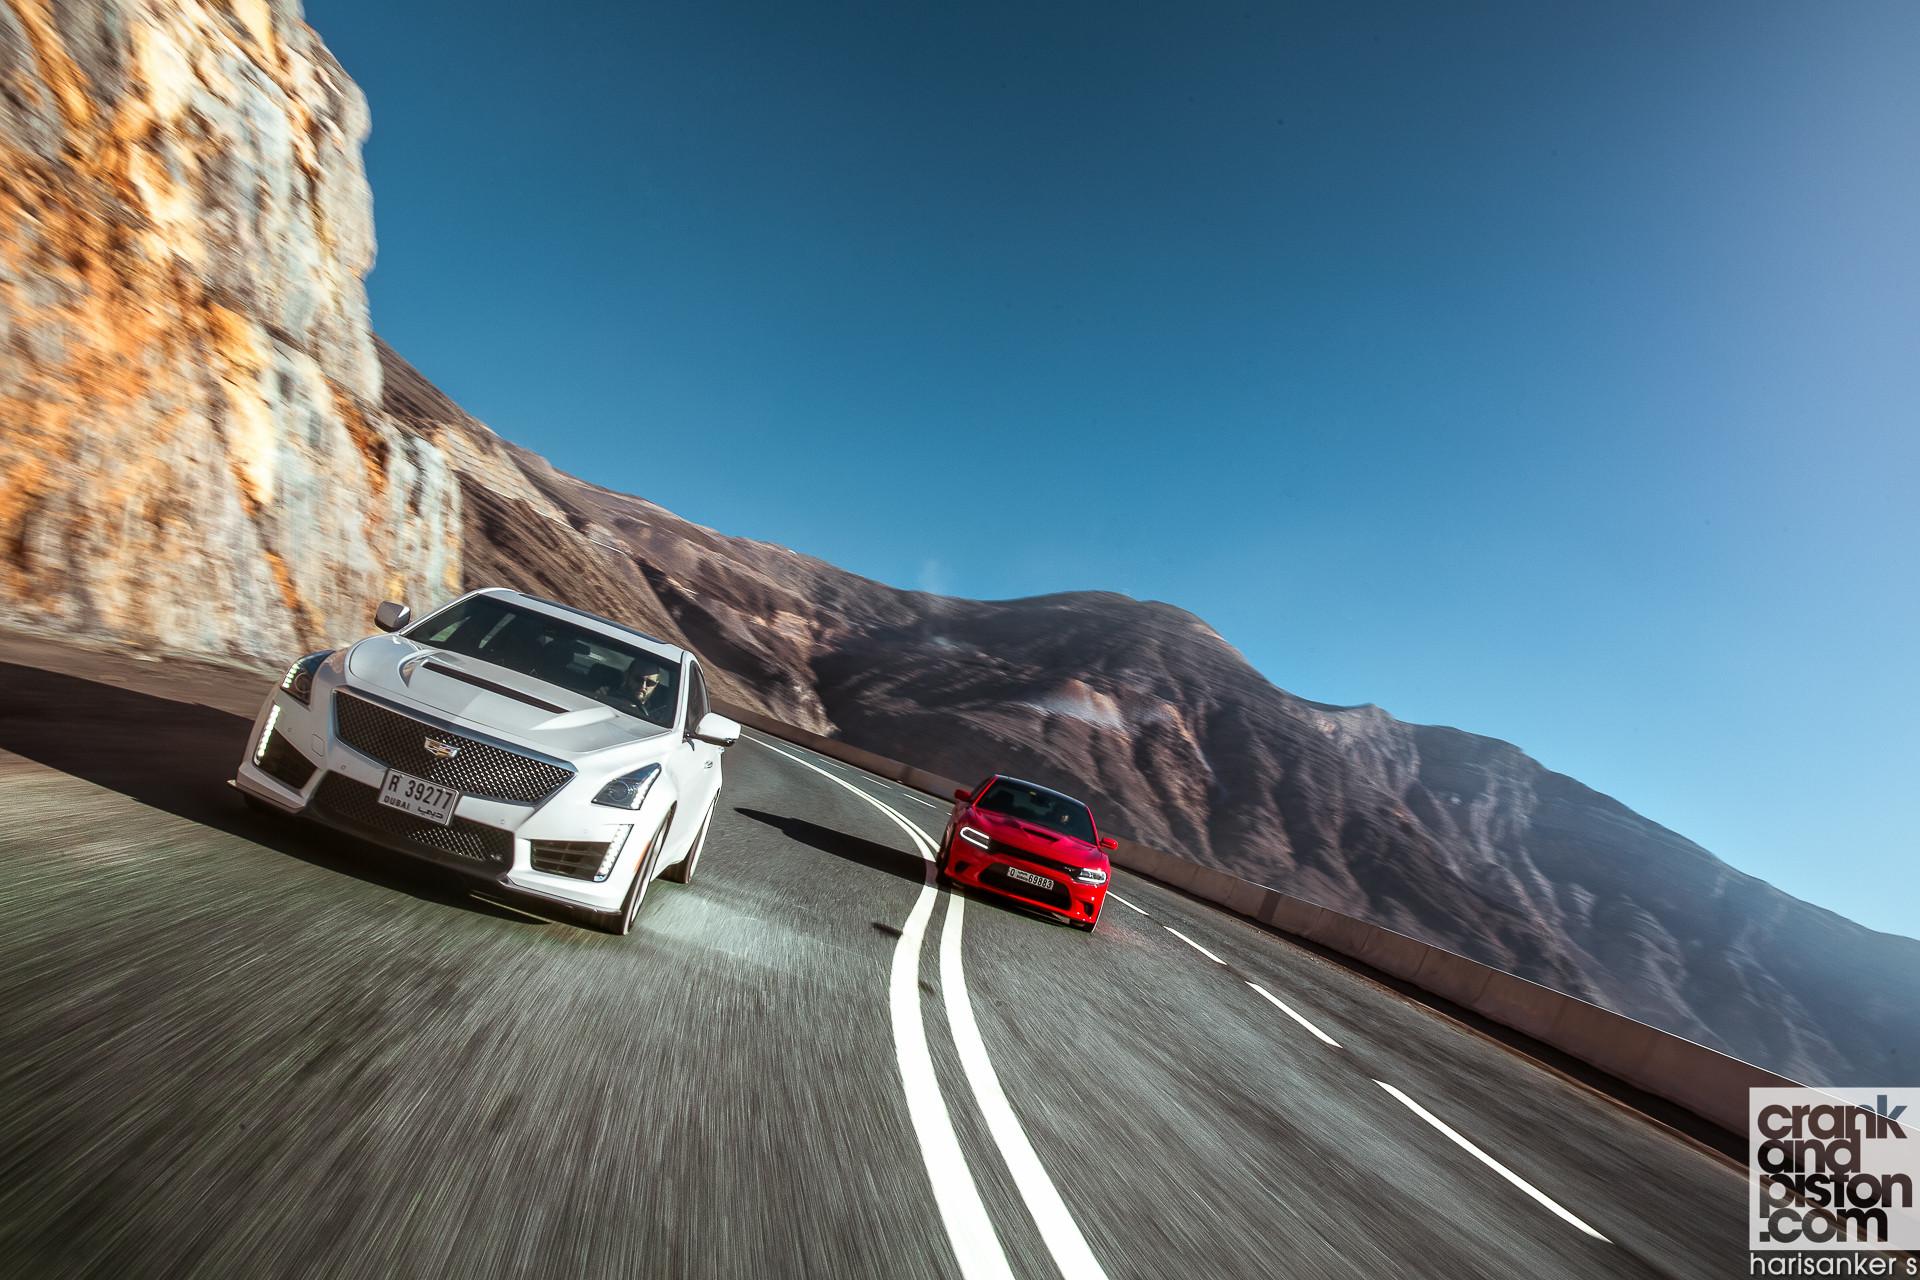 … Cadillac CTS-V vs Dodge Charger SRT Hellcat WALLPAPERS crankandpiston-5  …